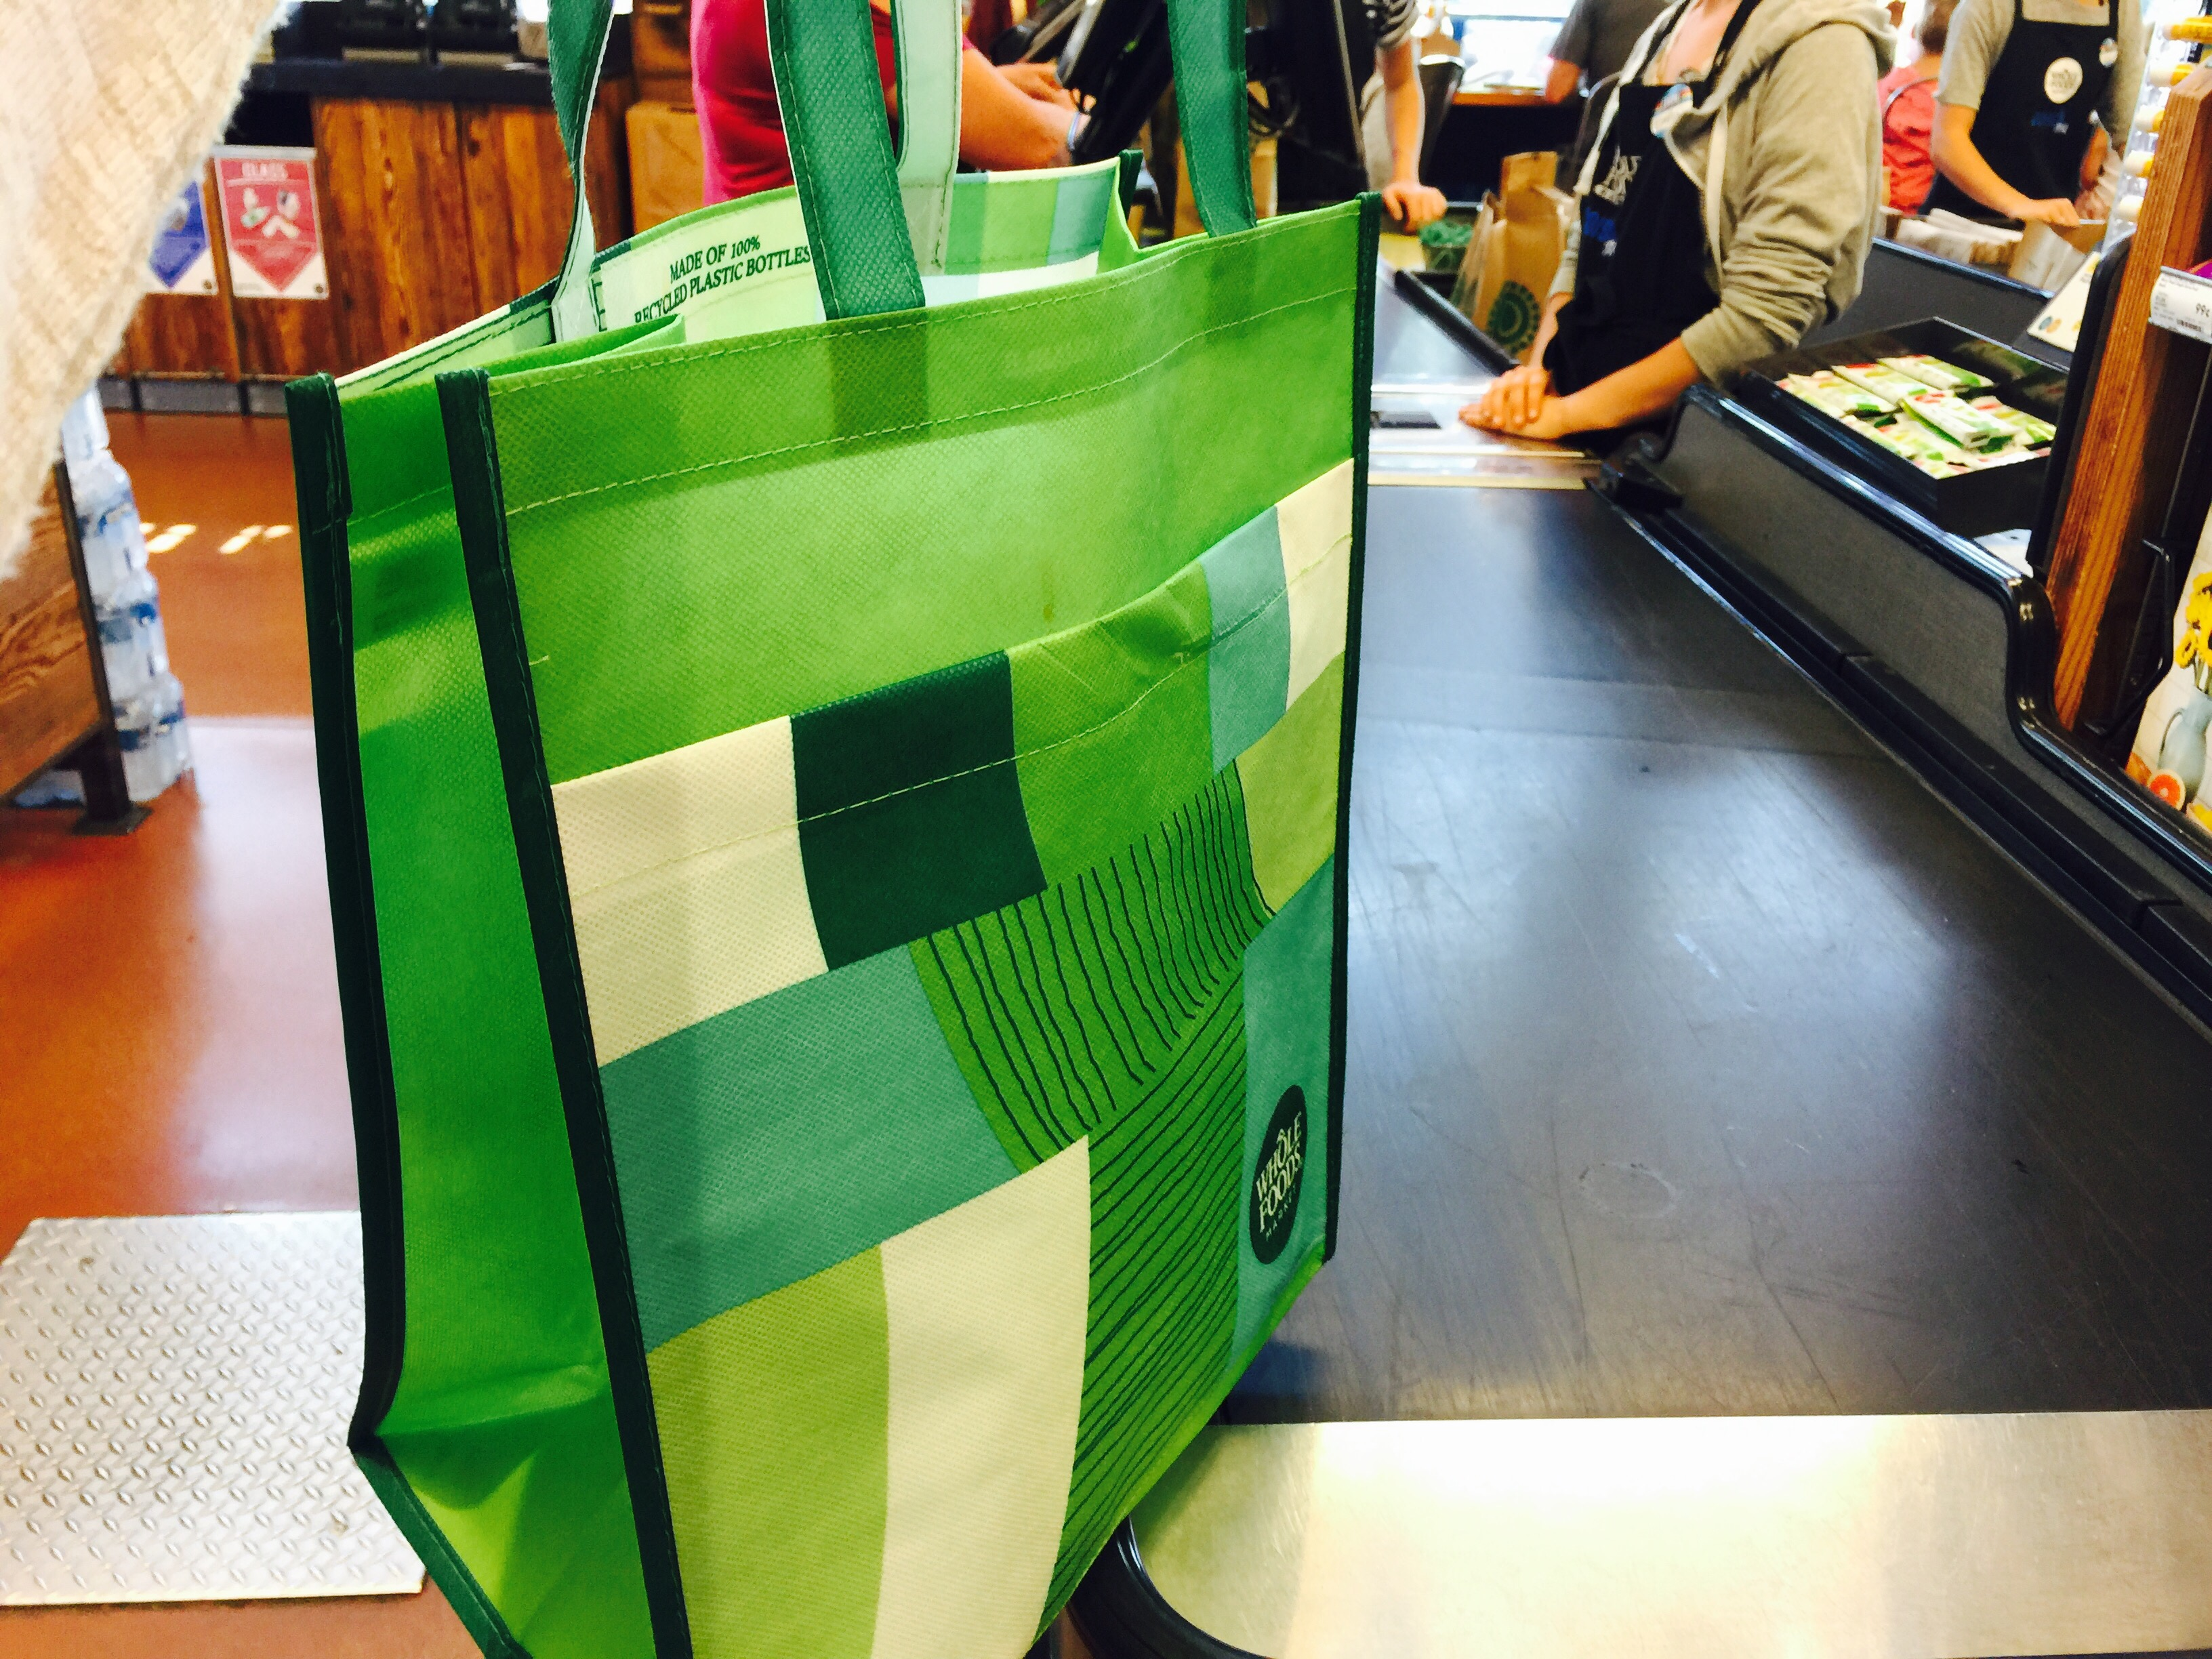 money-saving hacks at Whole Foods Market – reusable bag on a conveyor belt